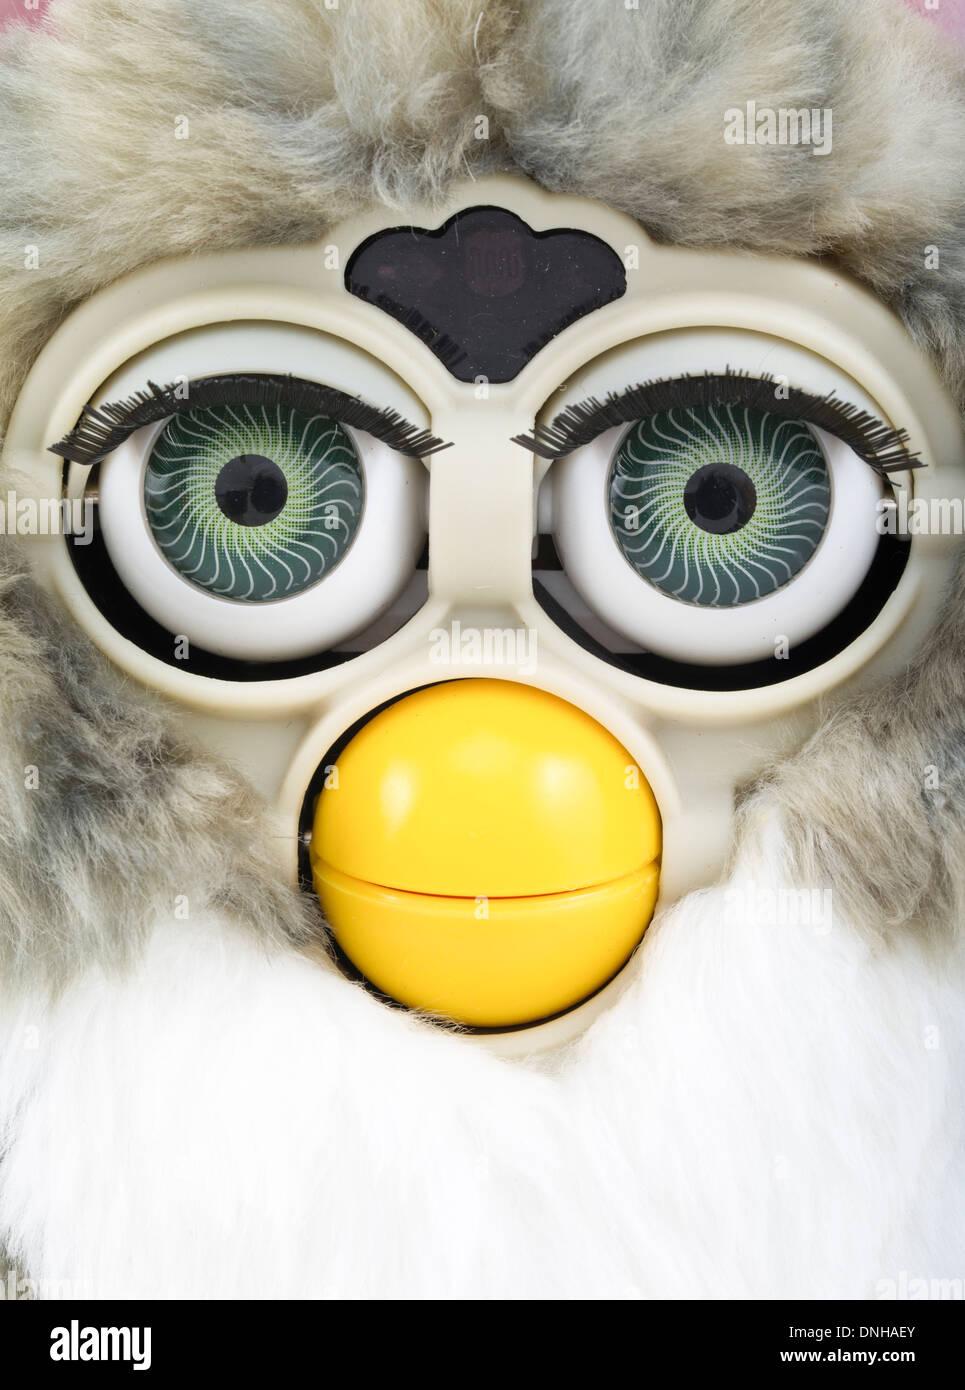 1998 Furby elektronische Roboter Spielzeug von Tiger Electronics Stockbild